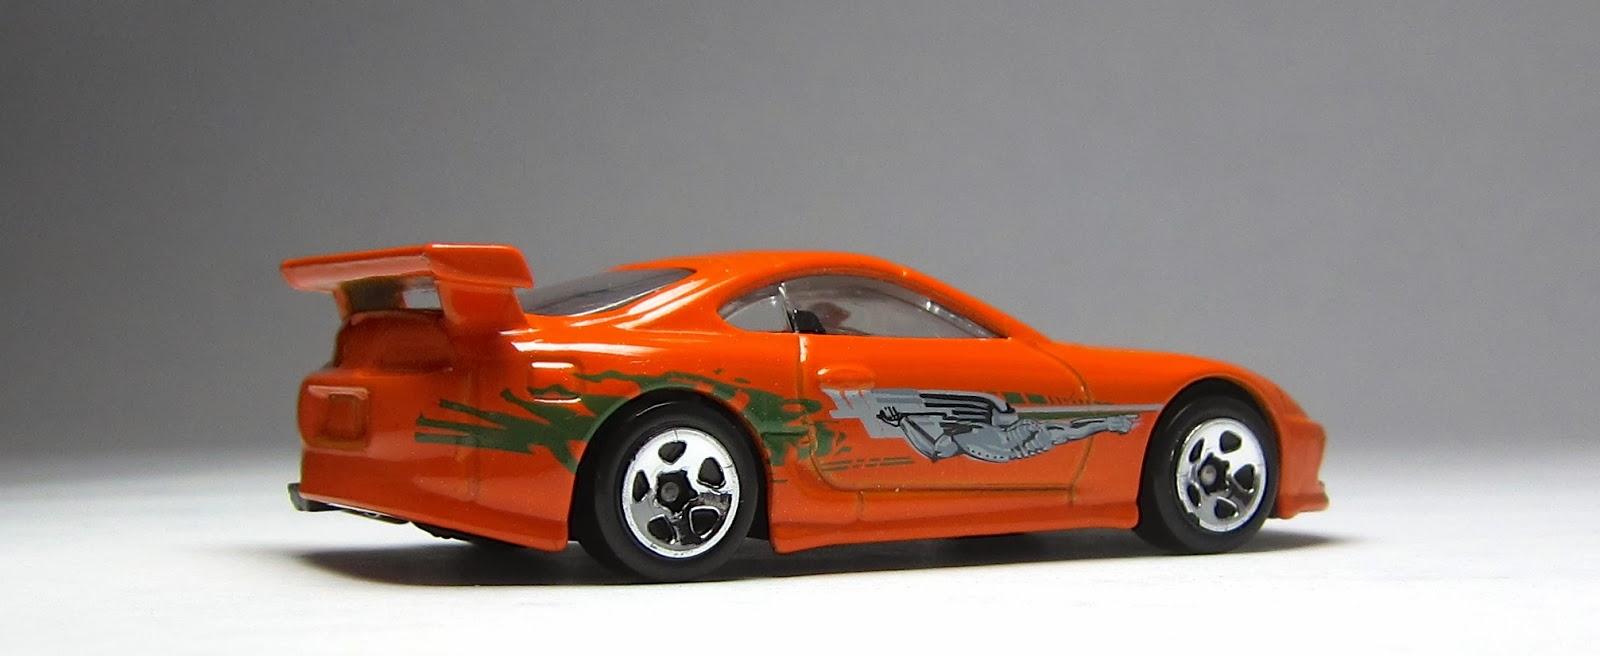 1600 x 656 · 92 kB · jpeg, 2014 McLaren P1 Price & Specs 2013 Aston